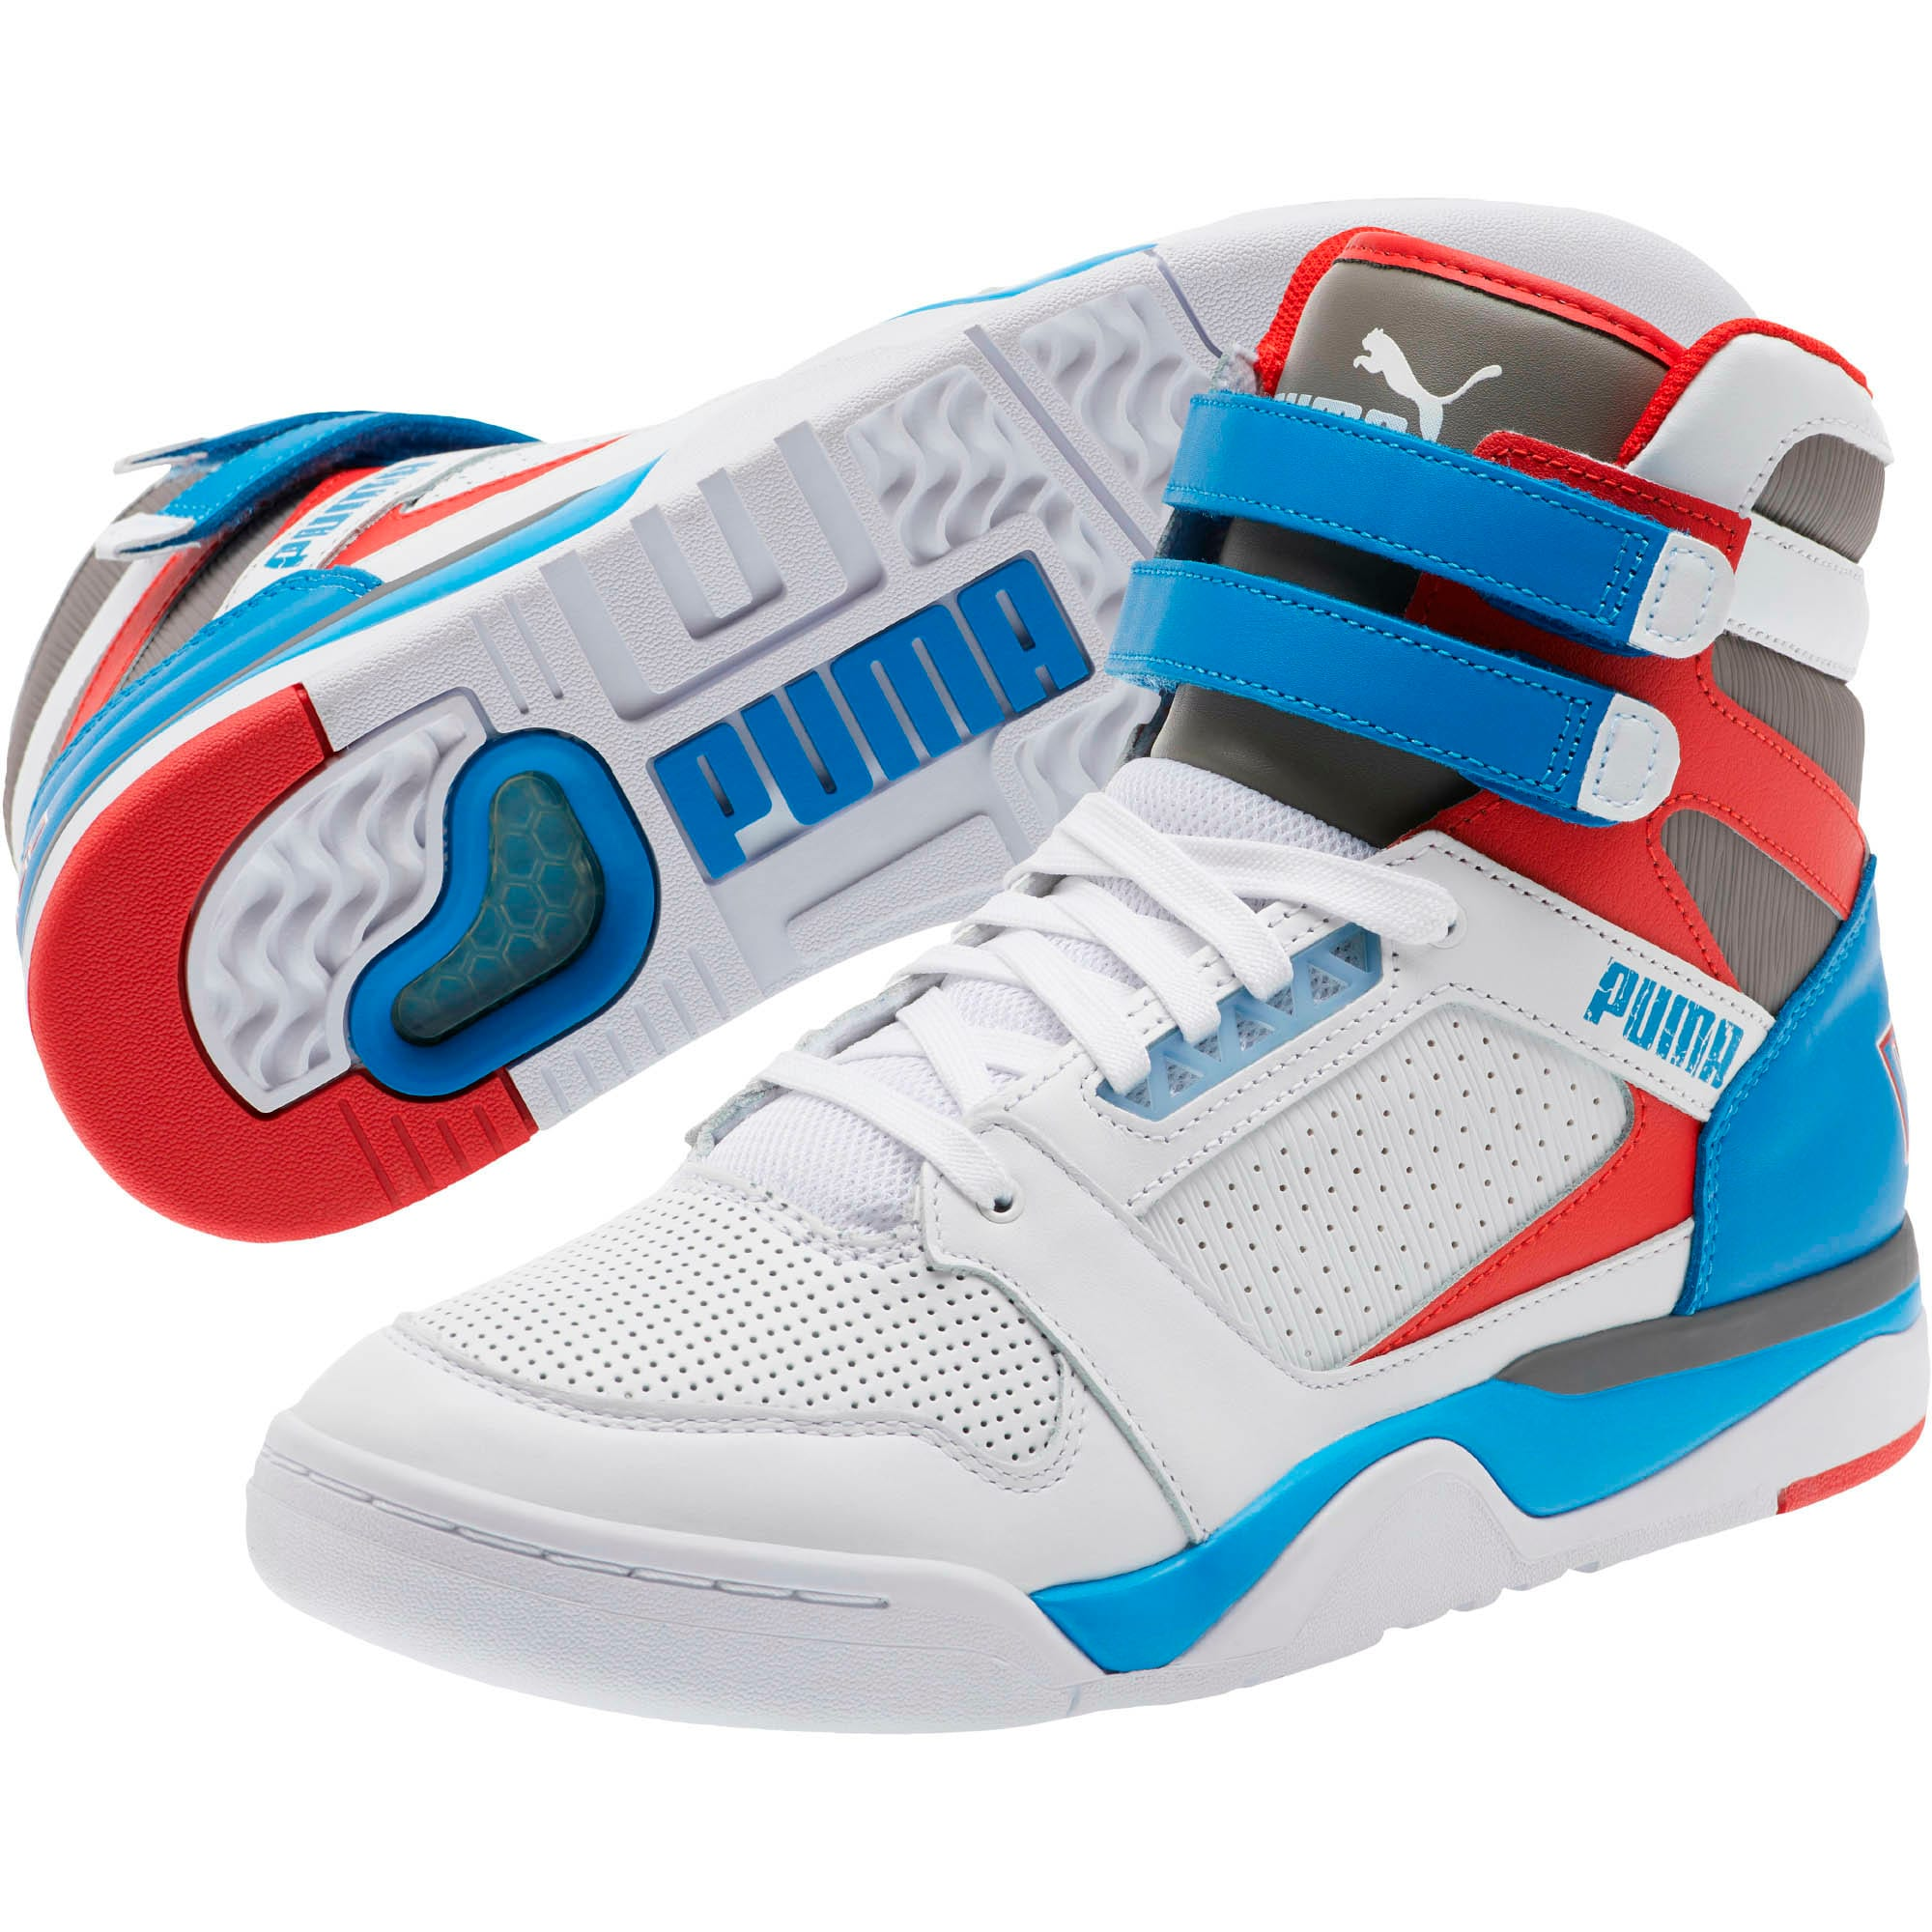 Thumbnail 2 of Palace Guard Mid Retro Sneakers, White-Indigo Bunting-Red, medium